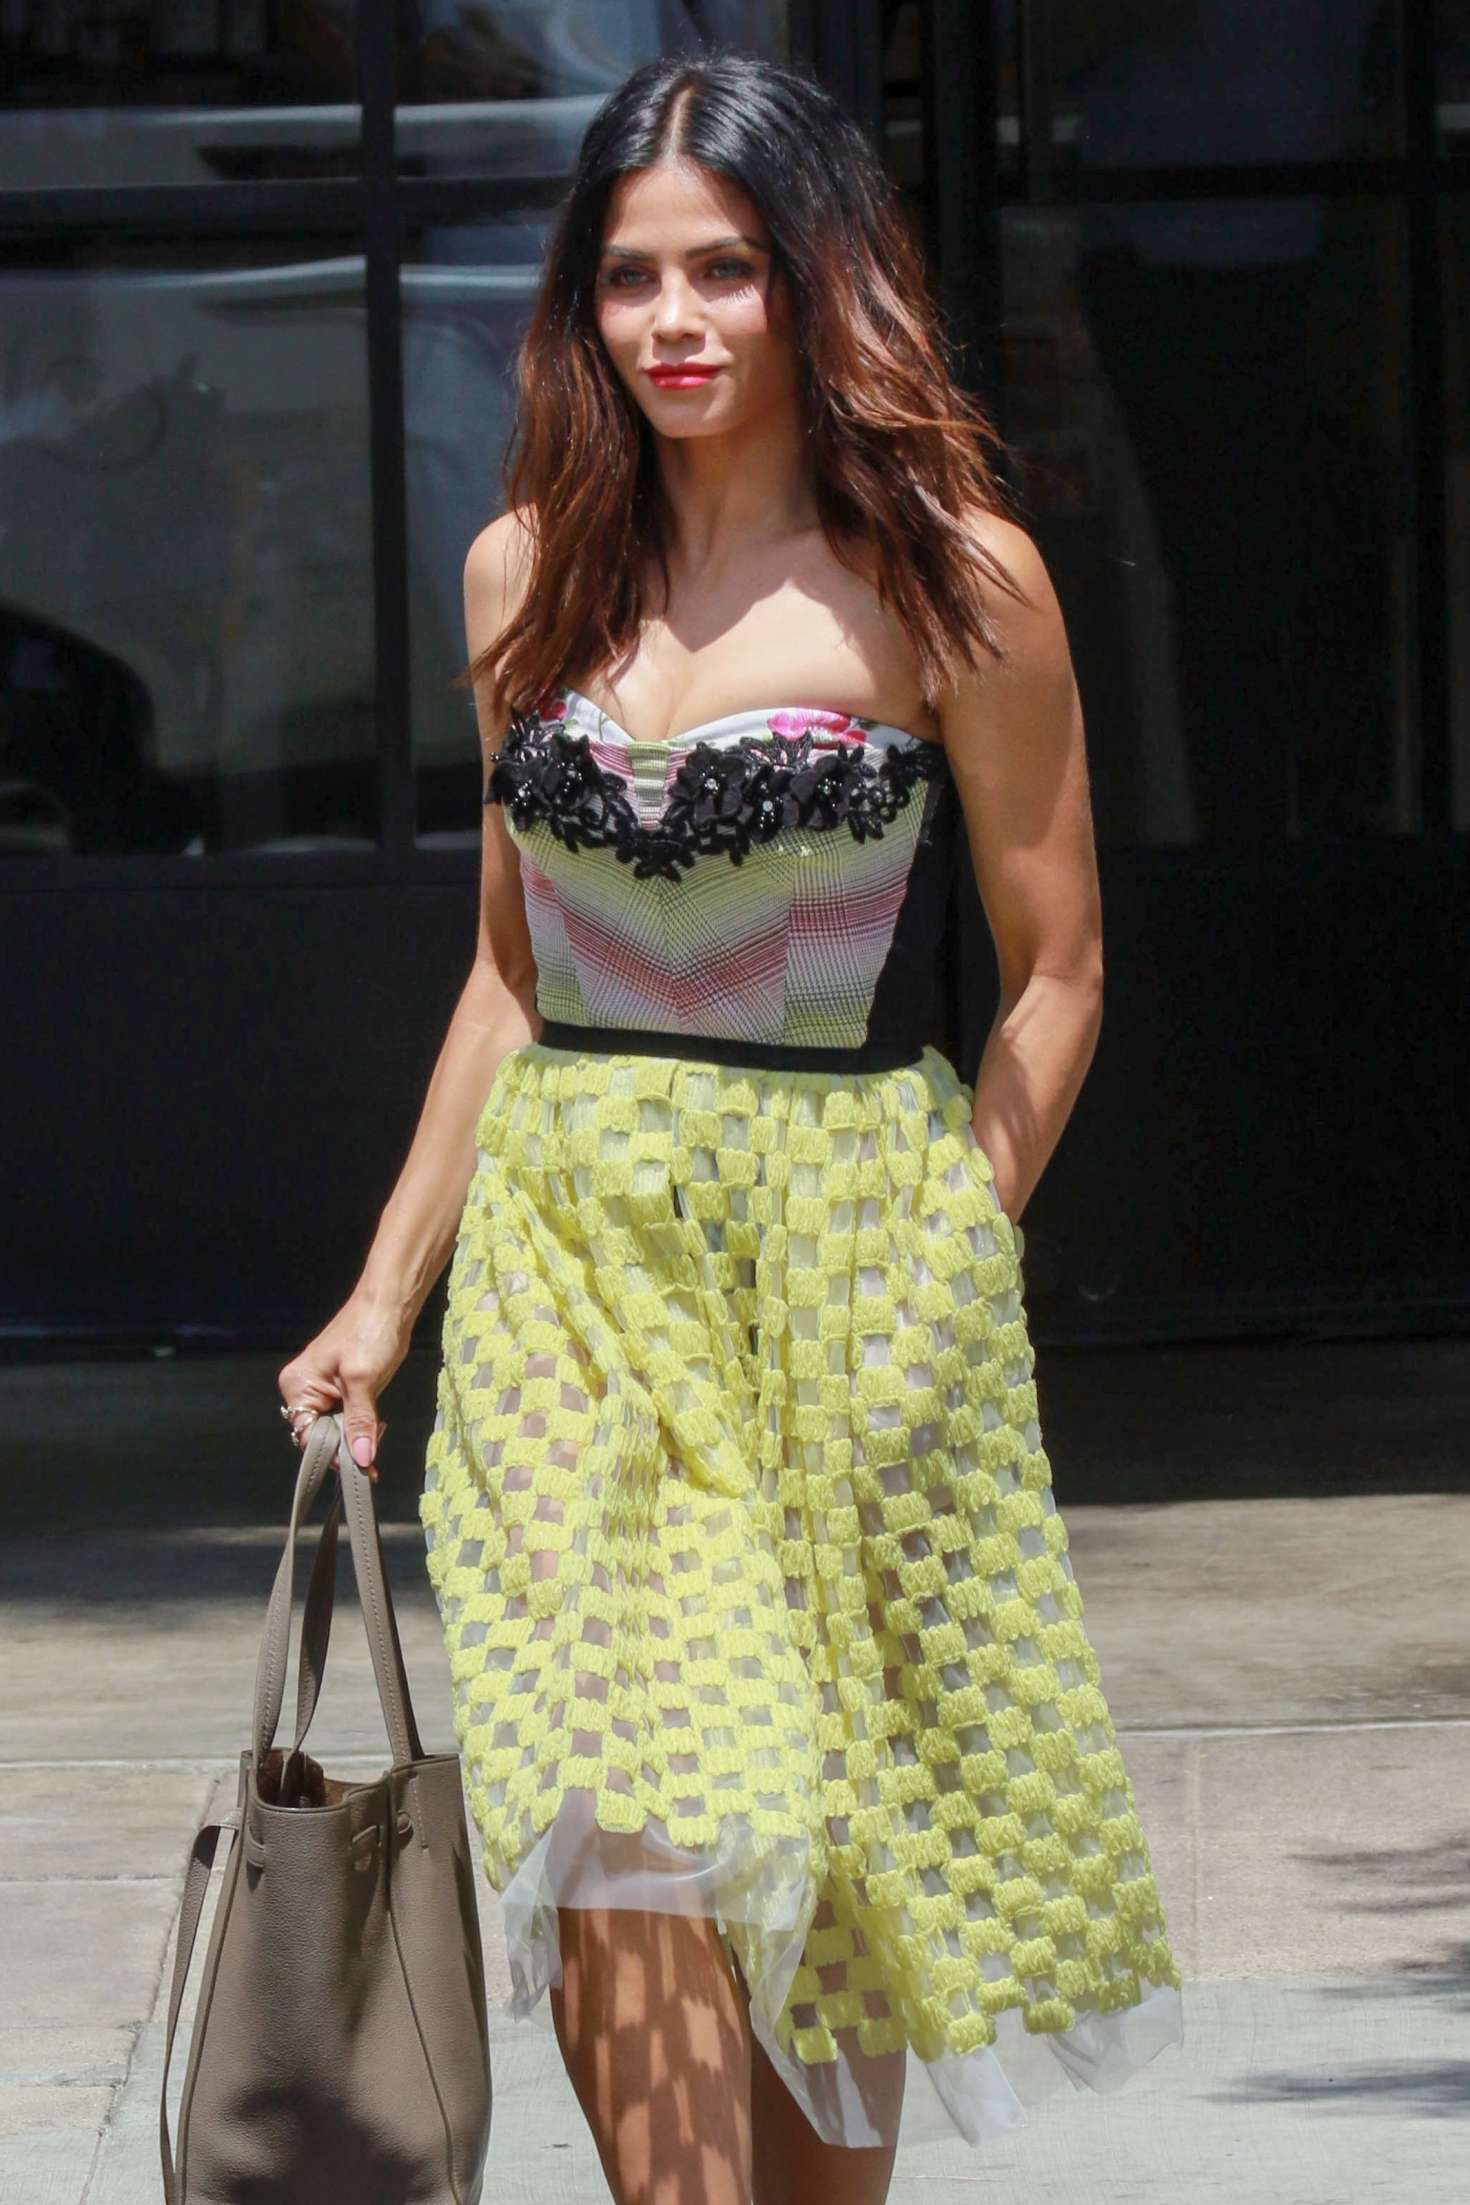 Jenna dewan leaving joans on third in hollywood